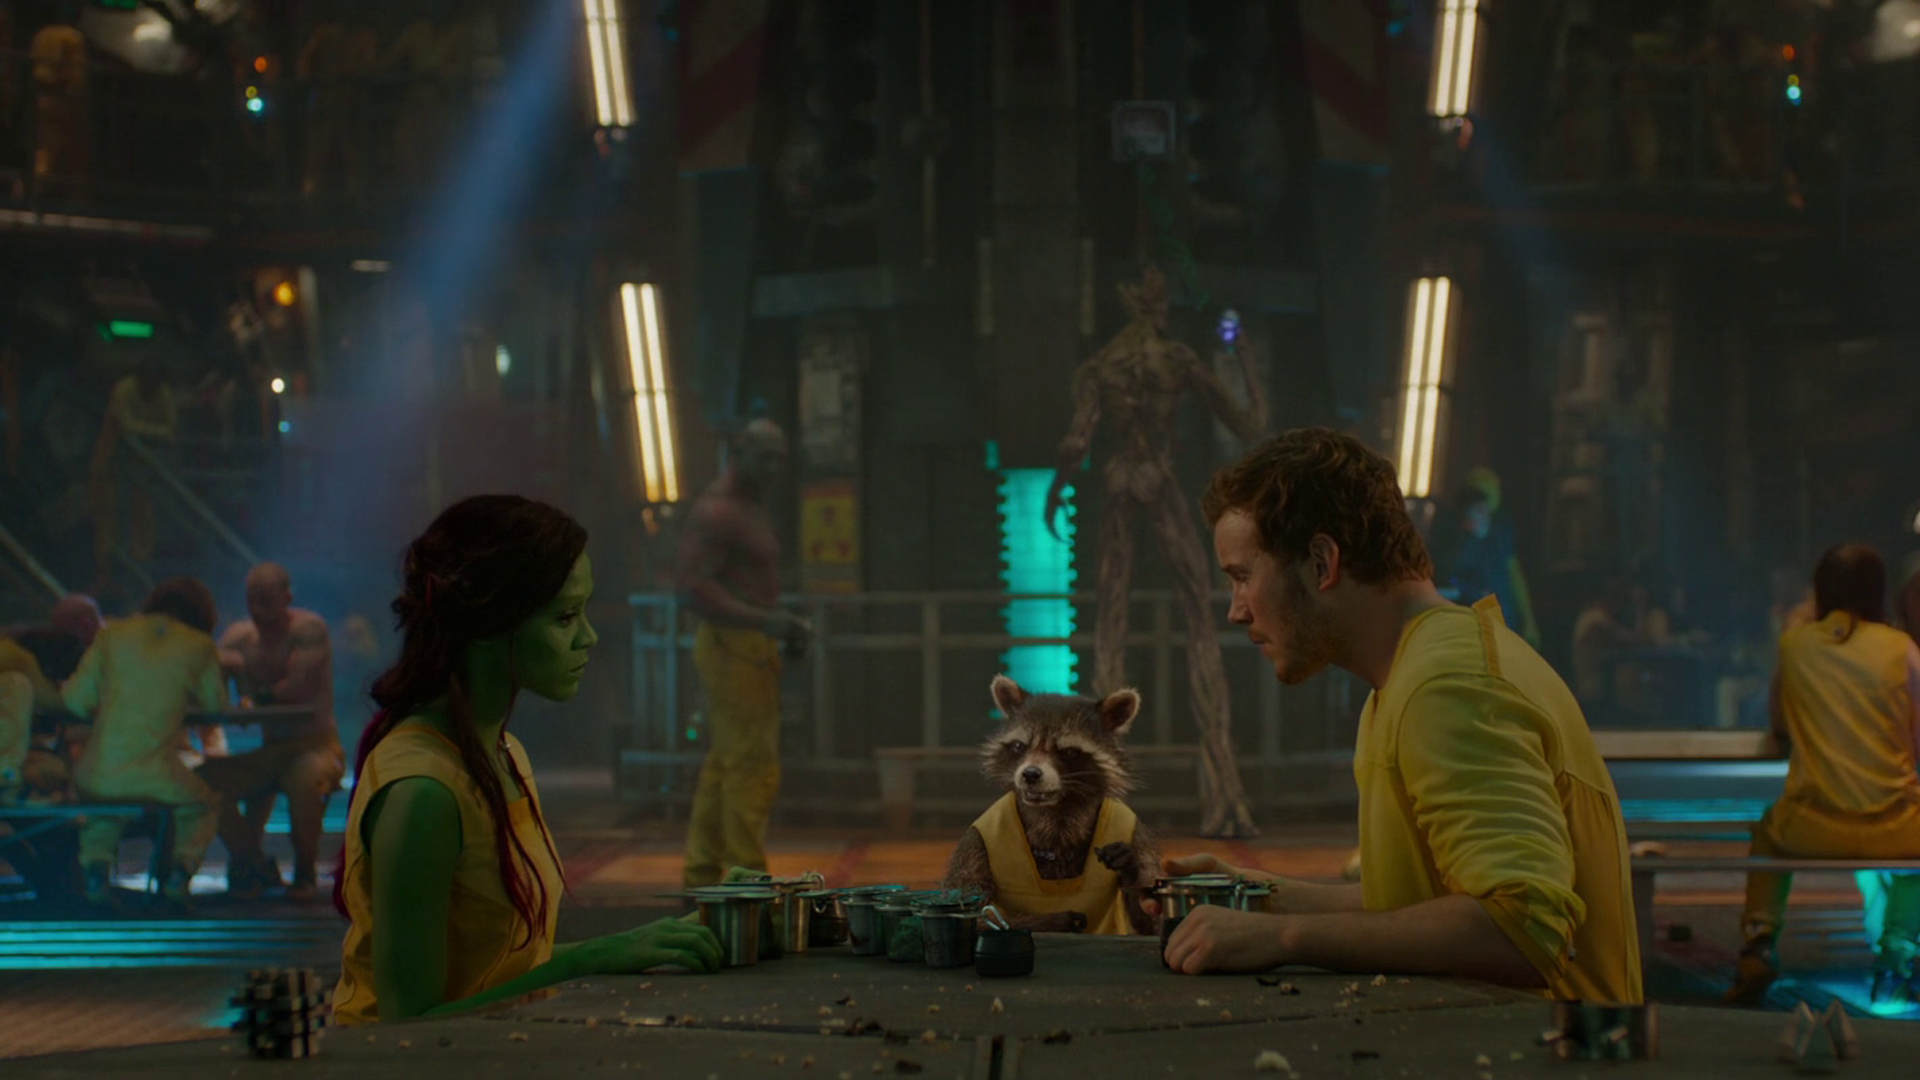 Movie - Guardians of the Galaxy  Chris Pratt Zoe Saldana Peter Quill Gamora Rocket Raccoon Wallpaper